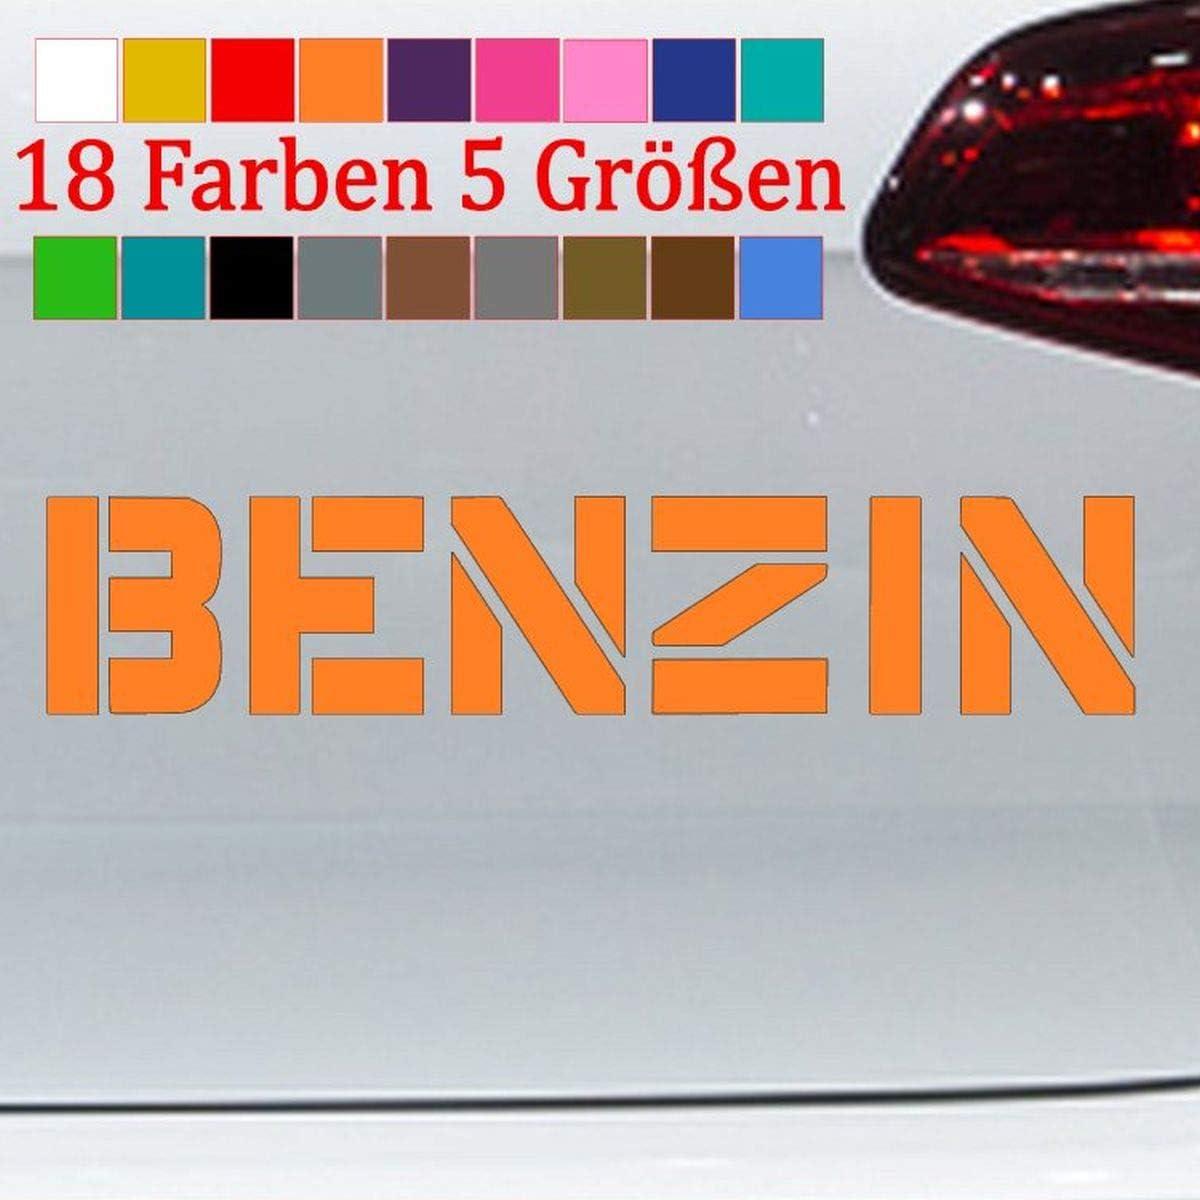 Generic Benzin Aufkleber Feinstaub VW Audi Plakette Tankdeckel Abgas 18 Farben 5 Gr/ö/ßen